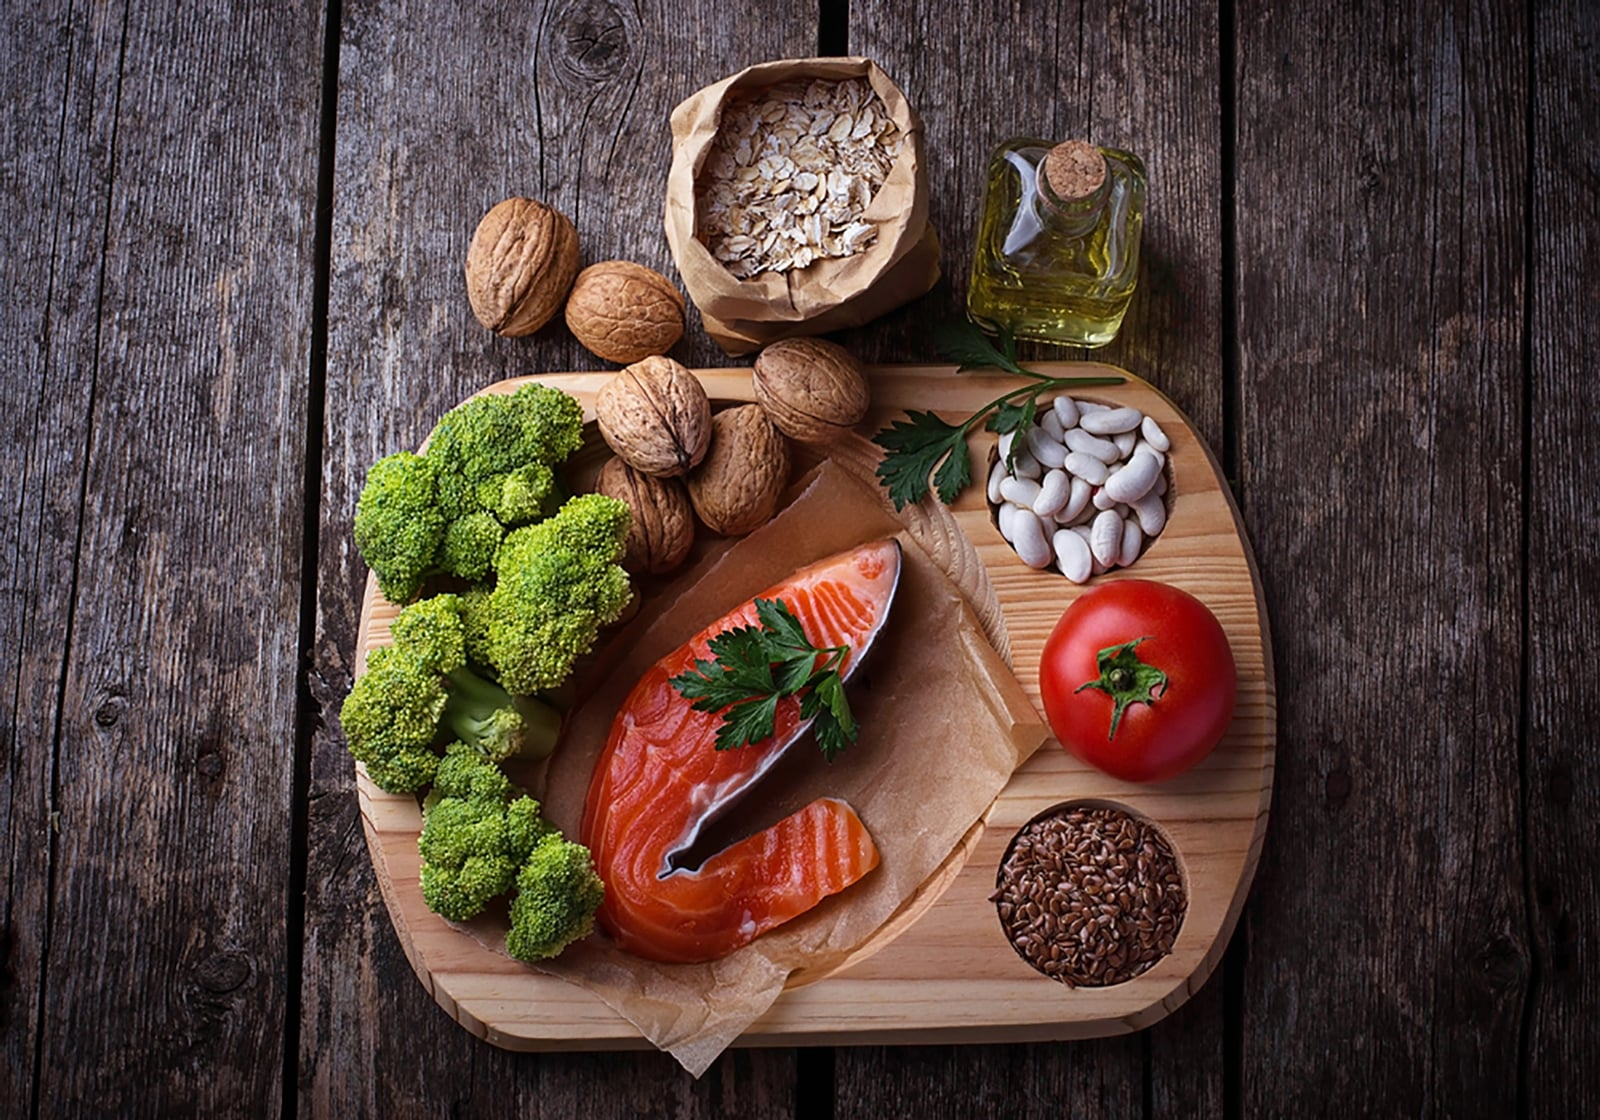 Superfood Lachs Omega 3 Leinsamen gesunde Fette Brokkoli Nüsse Haferflocken Öl